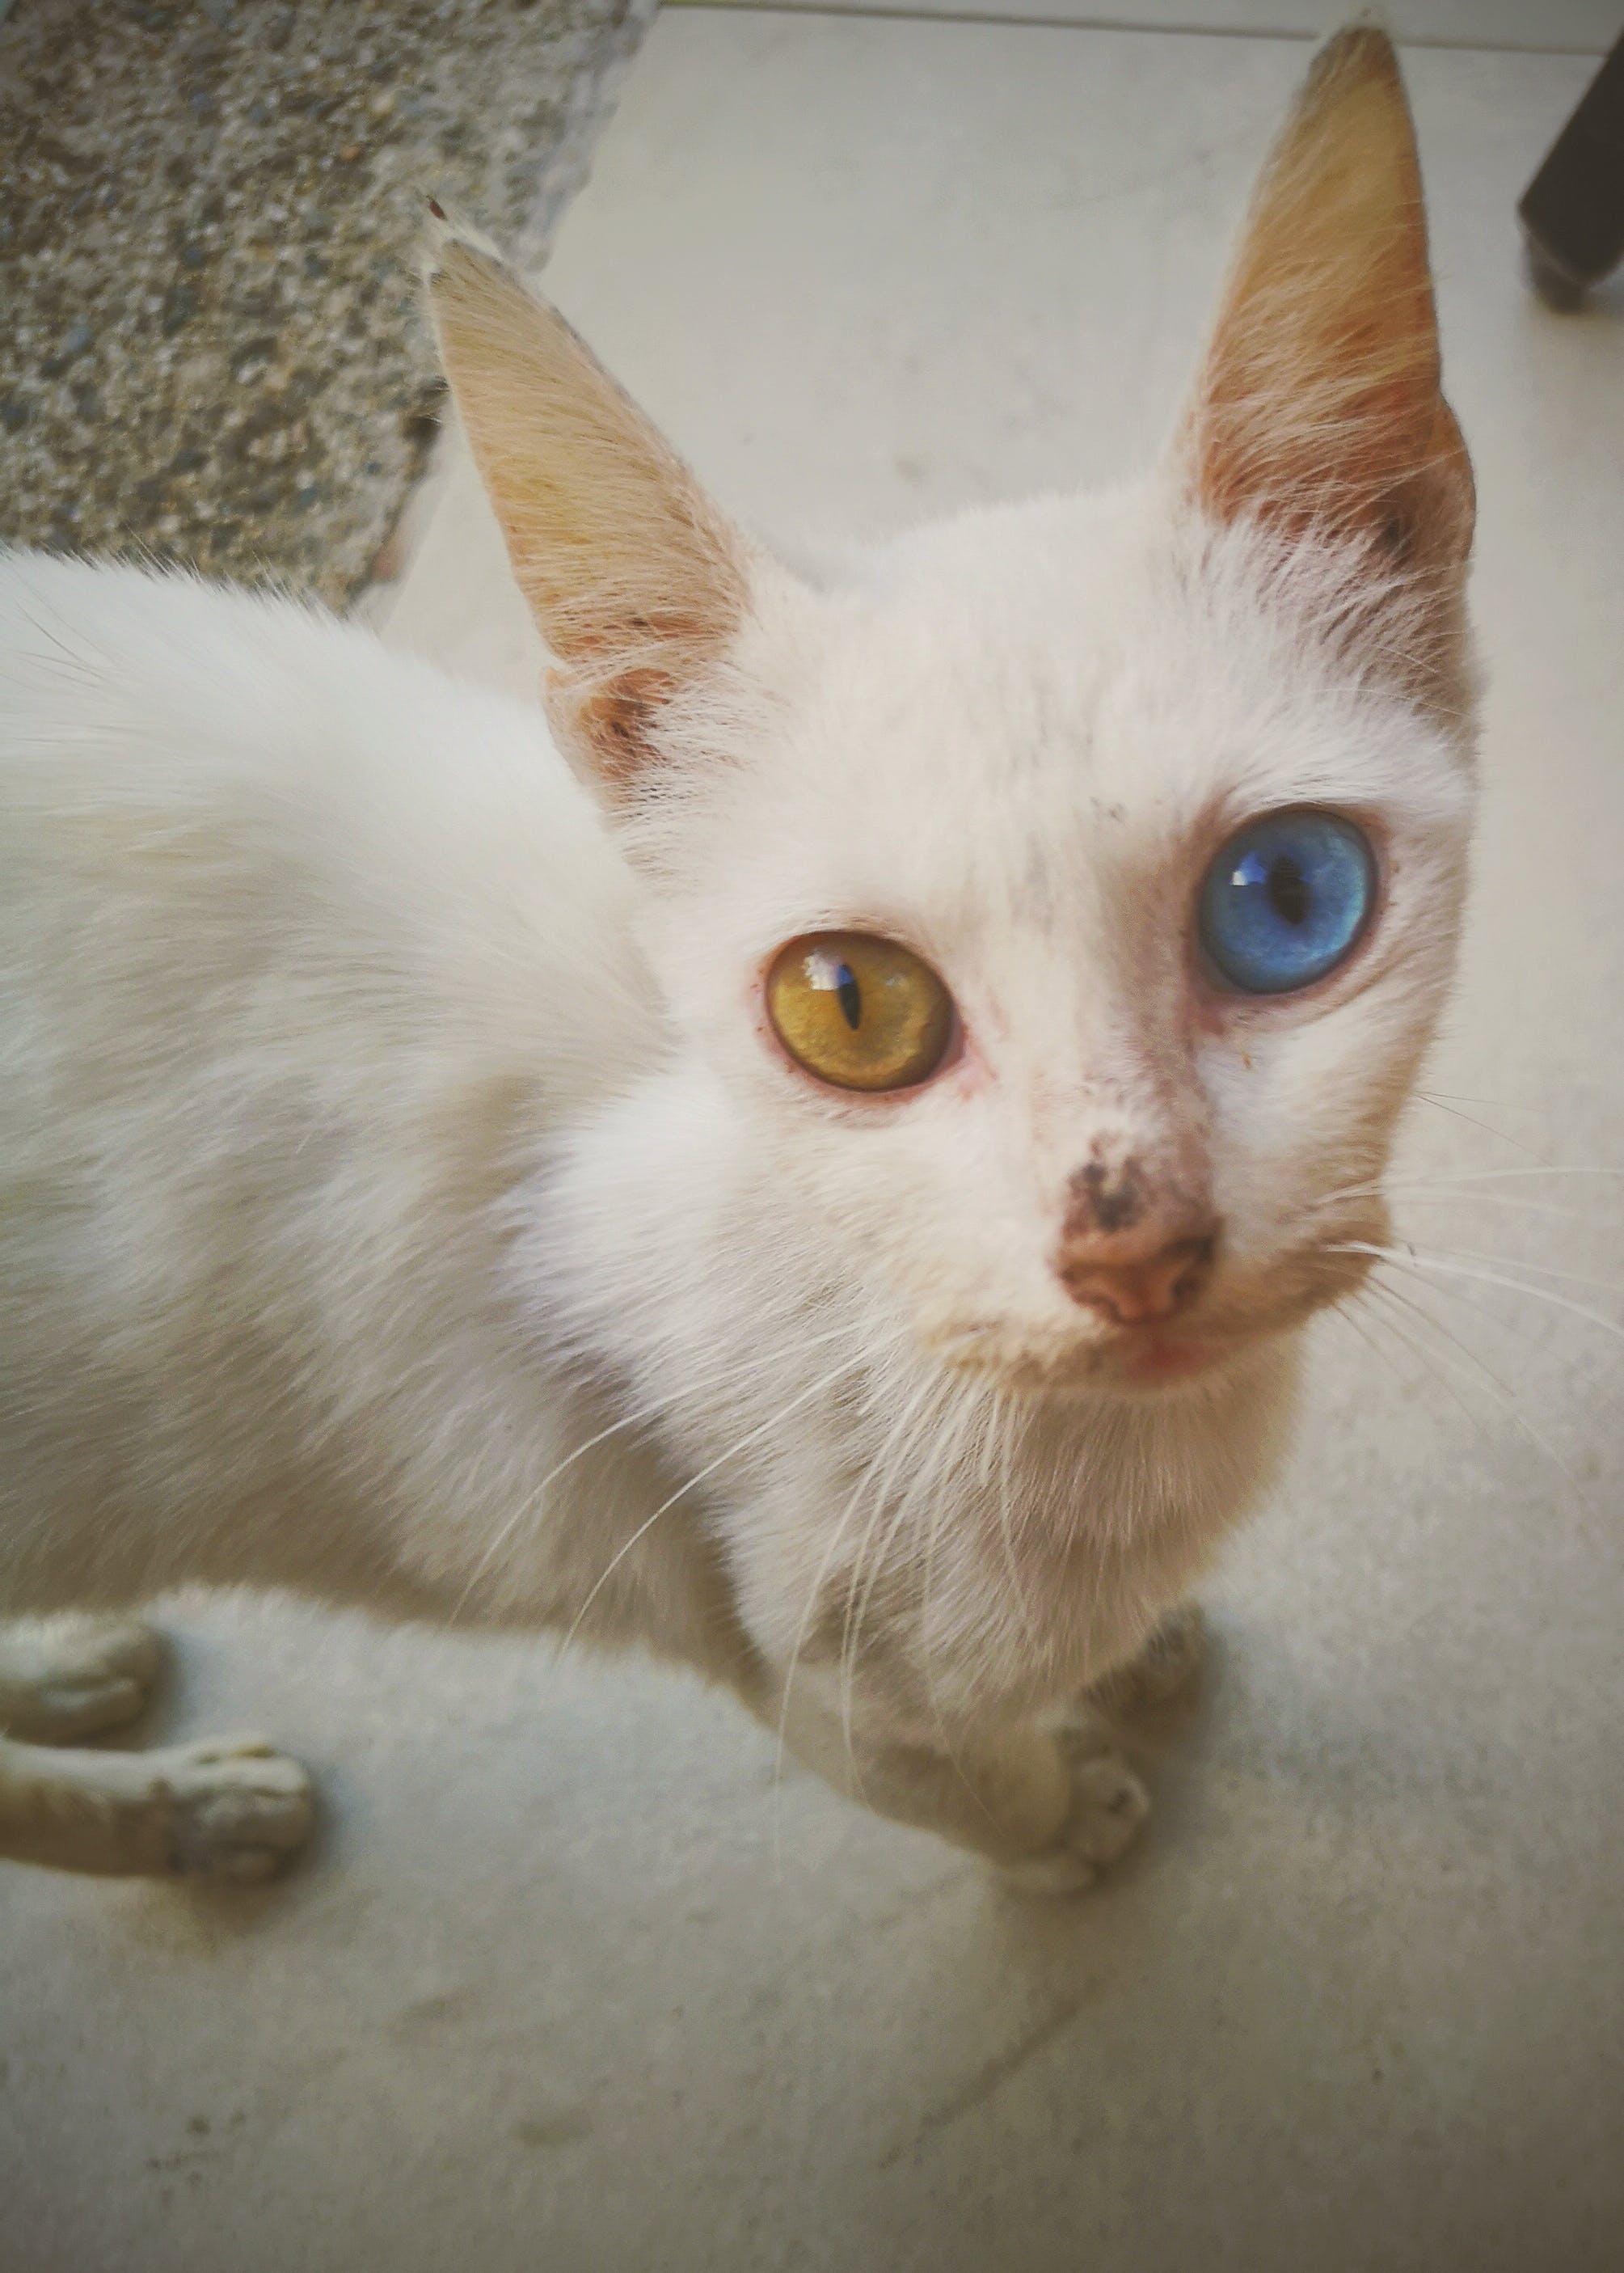 Free stock photo of #mobilechallenge, cat eye